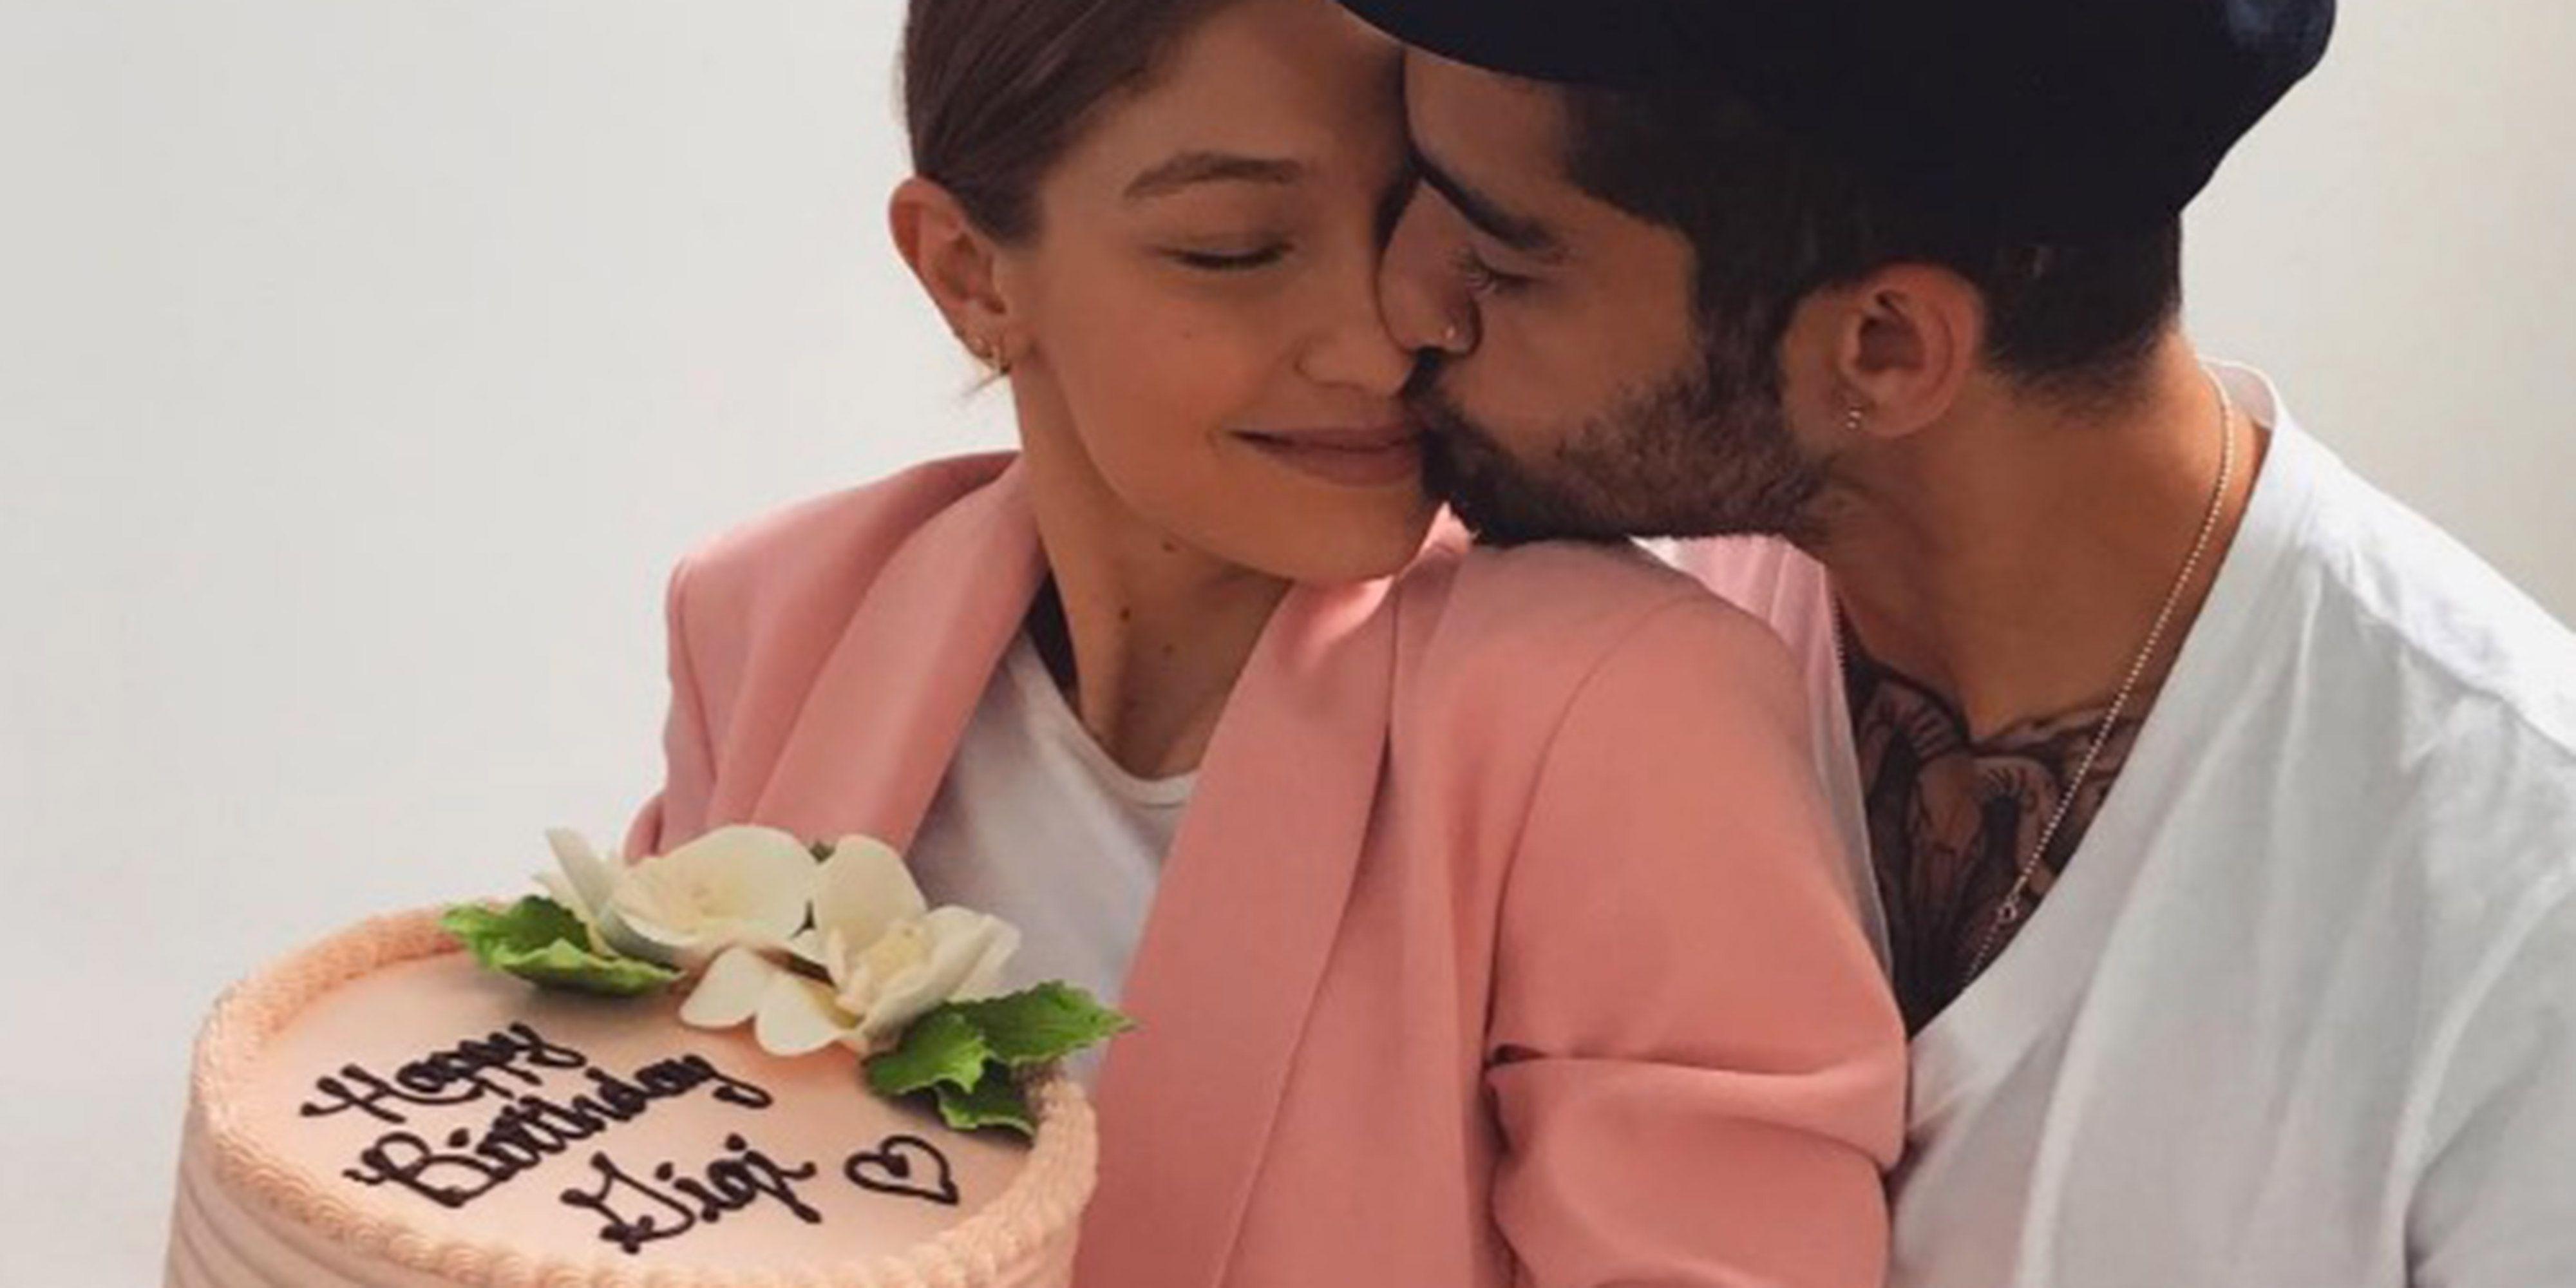 Zayn Malik showers girlfriend Gigi Hadid with love on her birthday